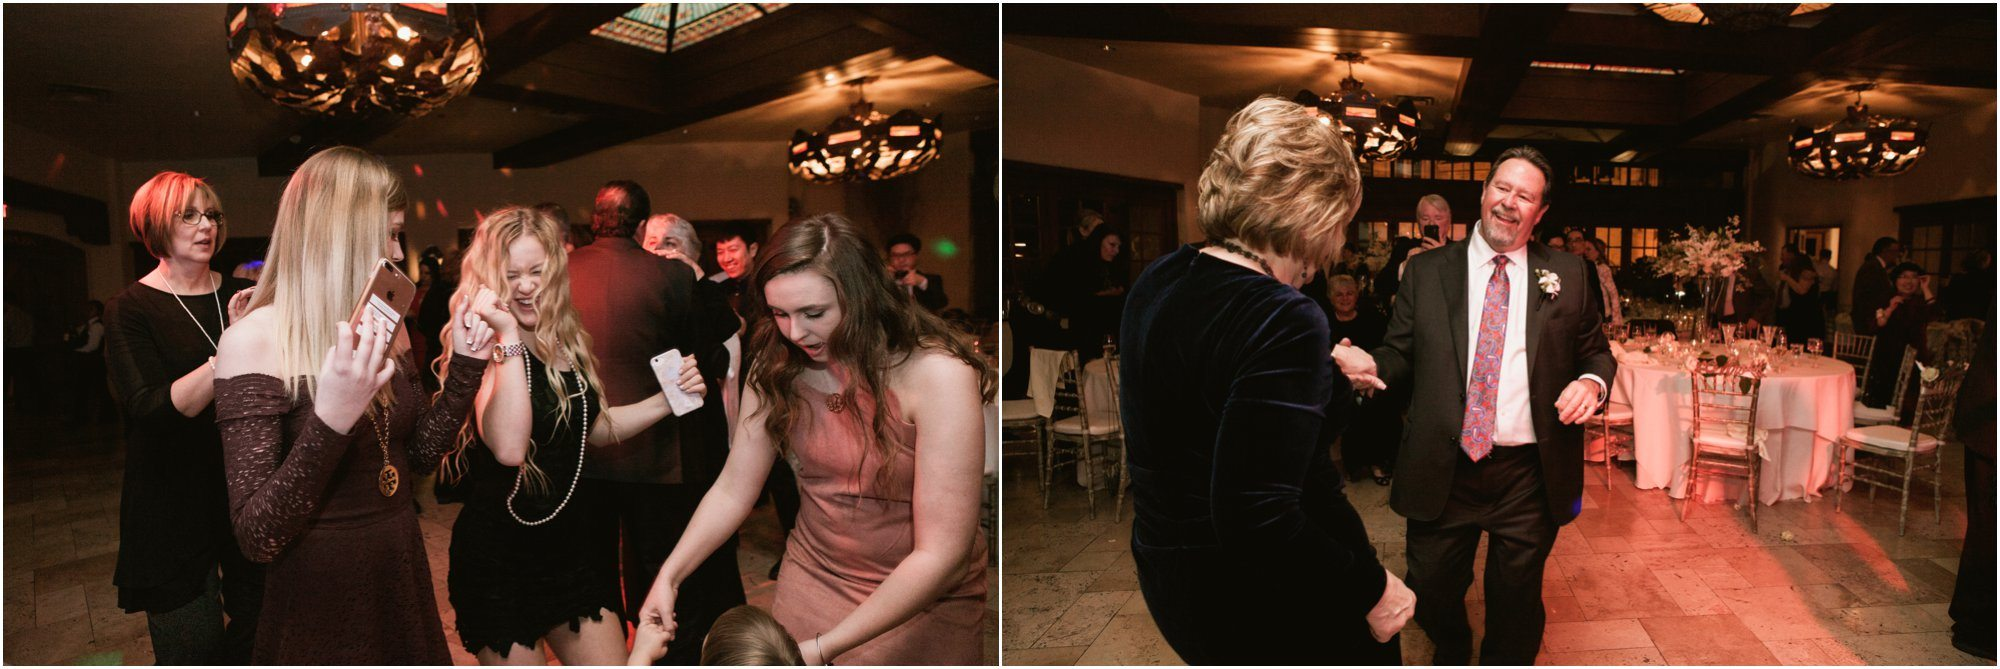 036Albuquerque wedding photographers_ Blue Rose Photography_ Santa Fe wedding photographers_ New Mexico Wedding photography